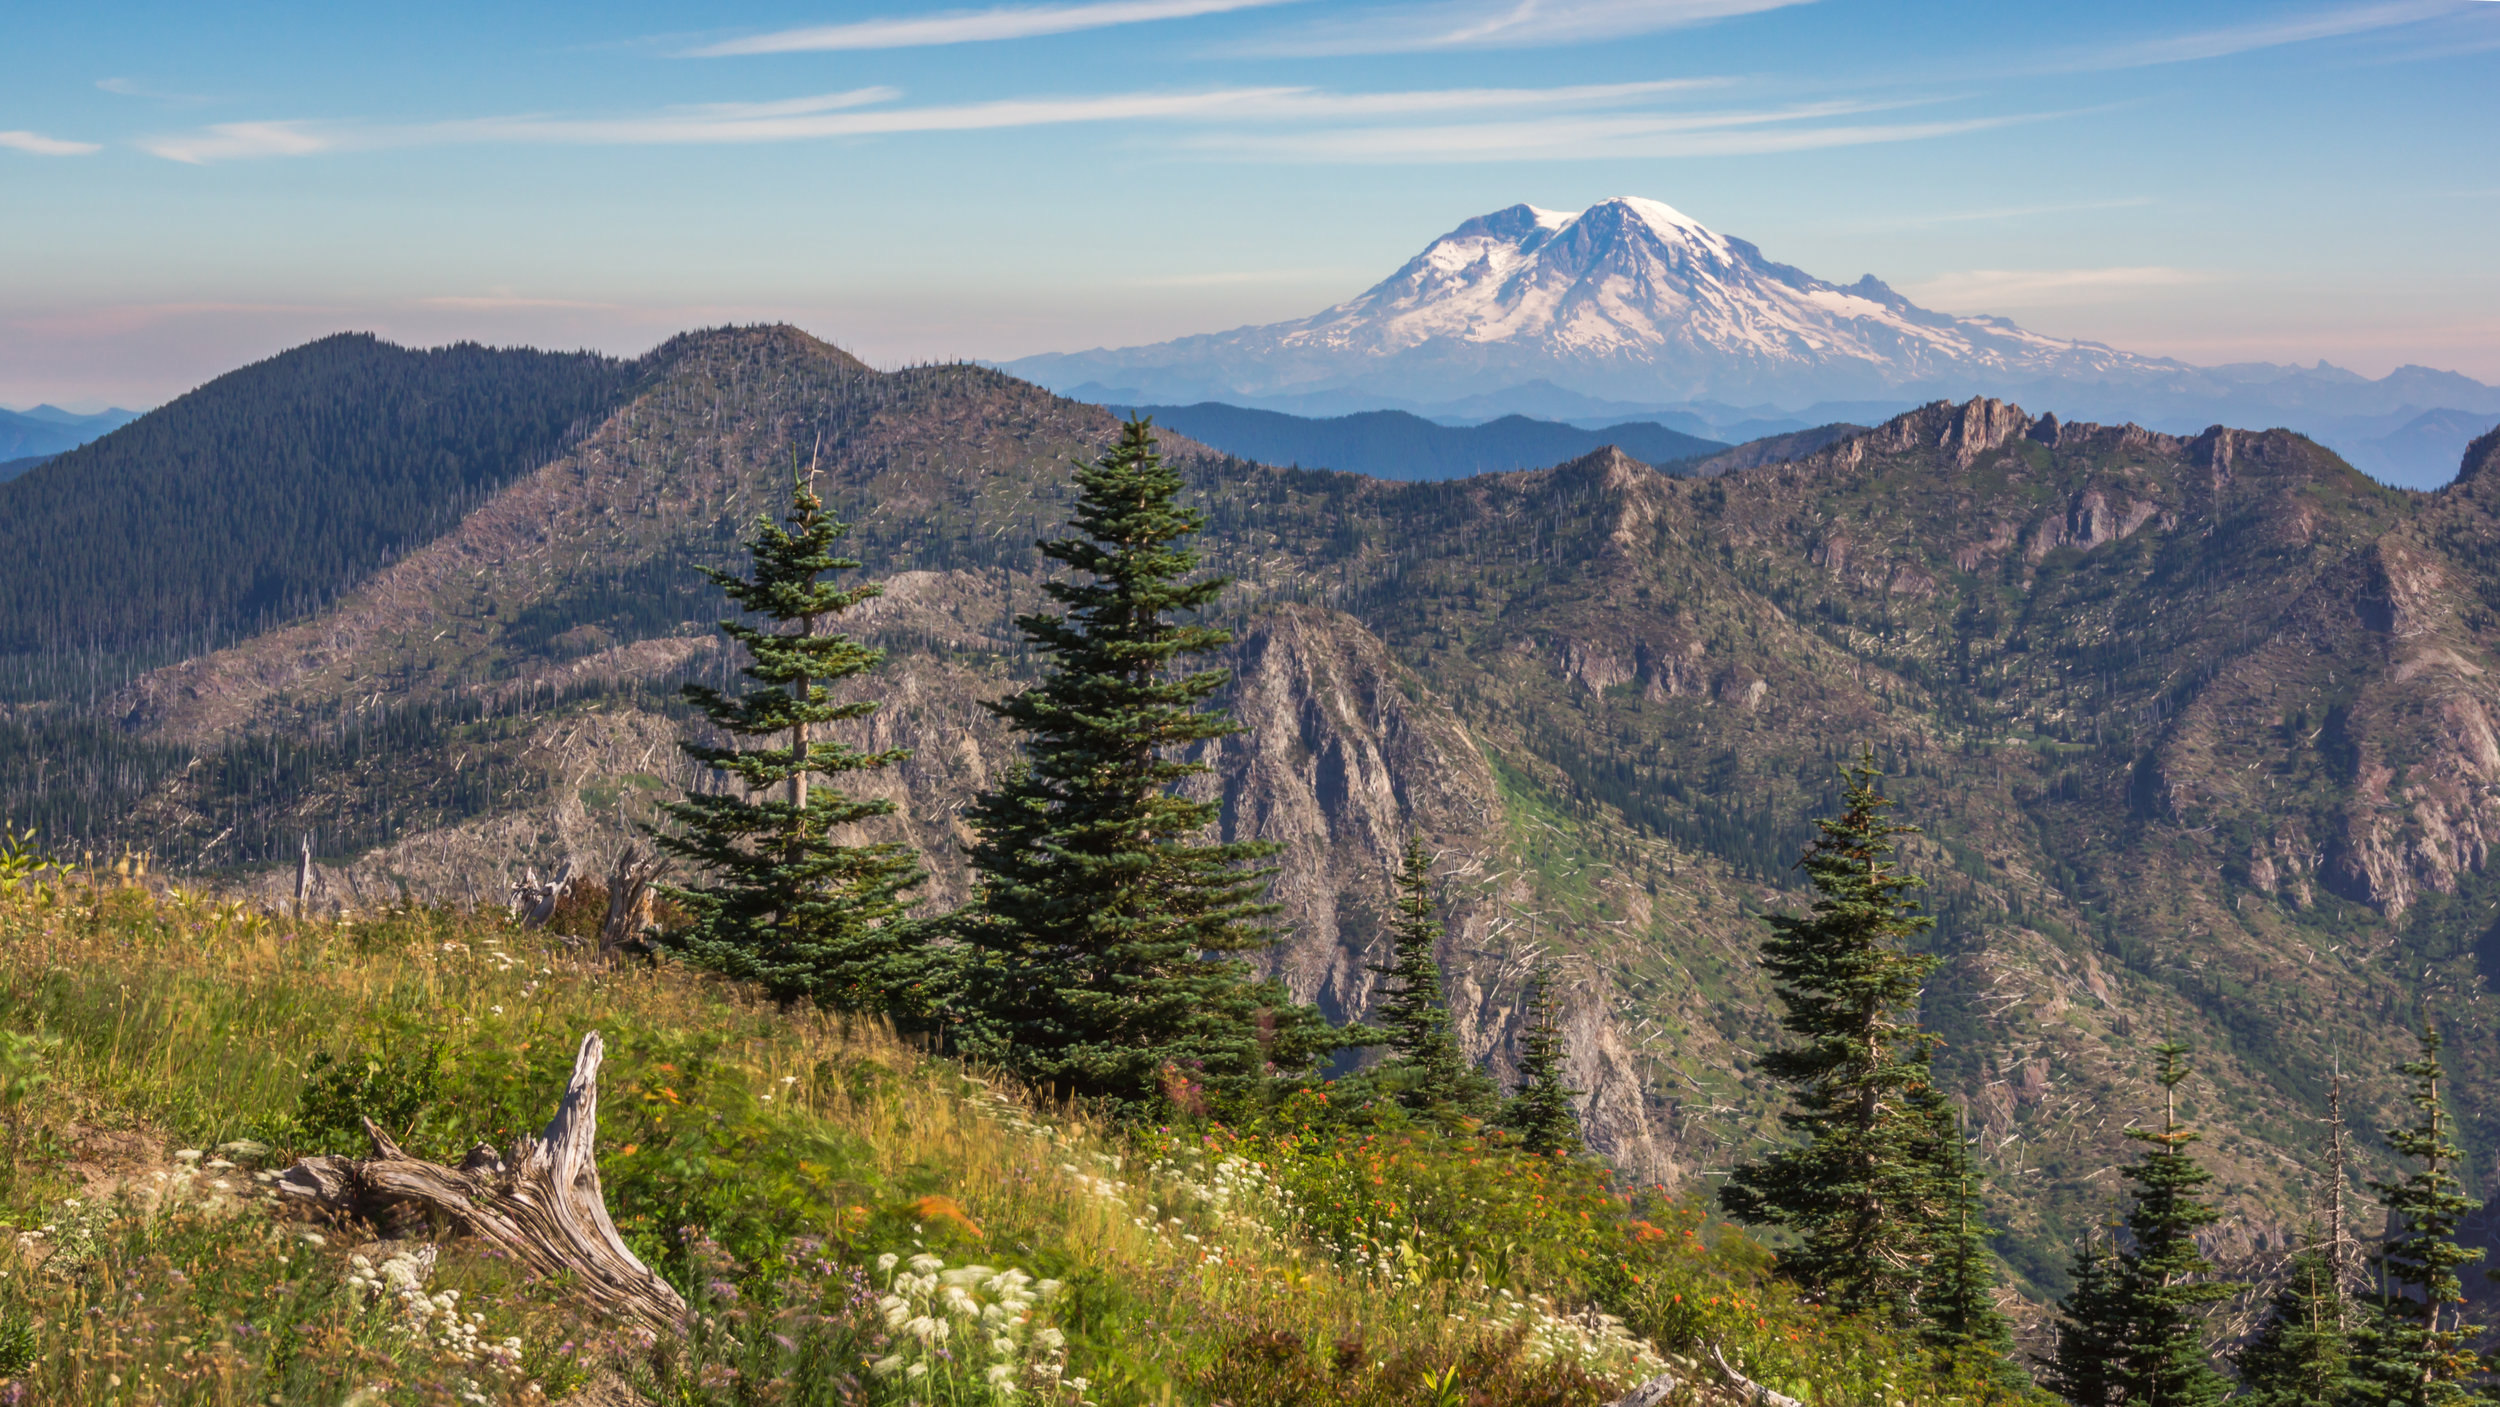 Mount Rainier from Coldwater Peak.